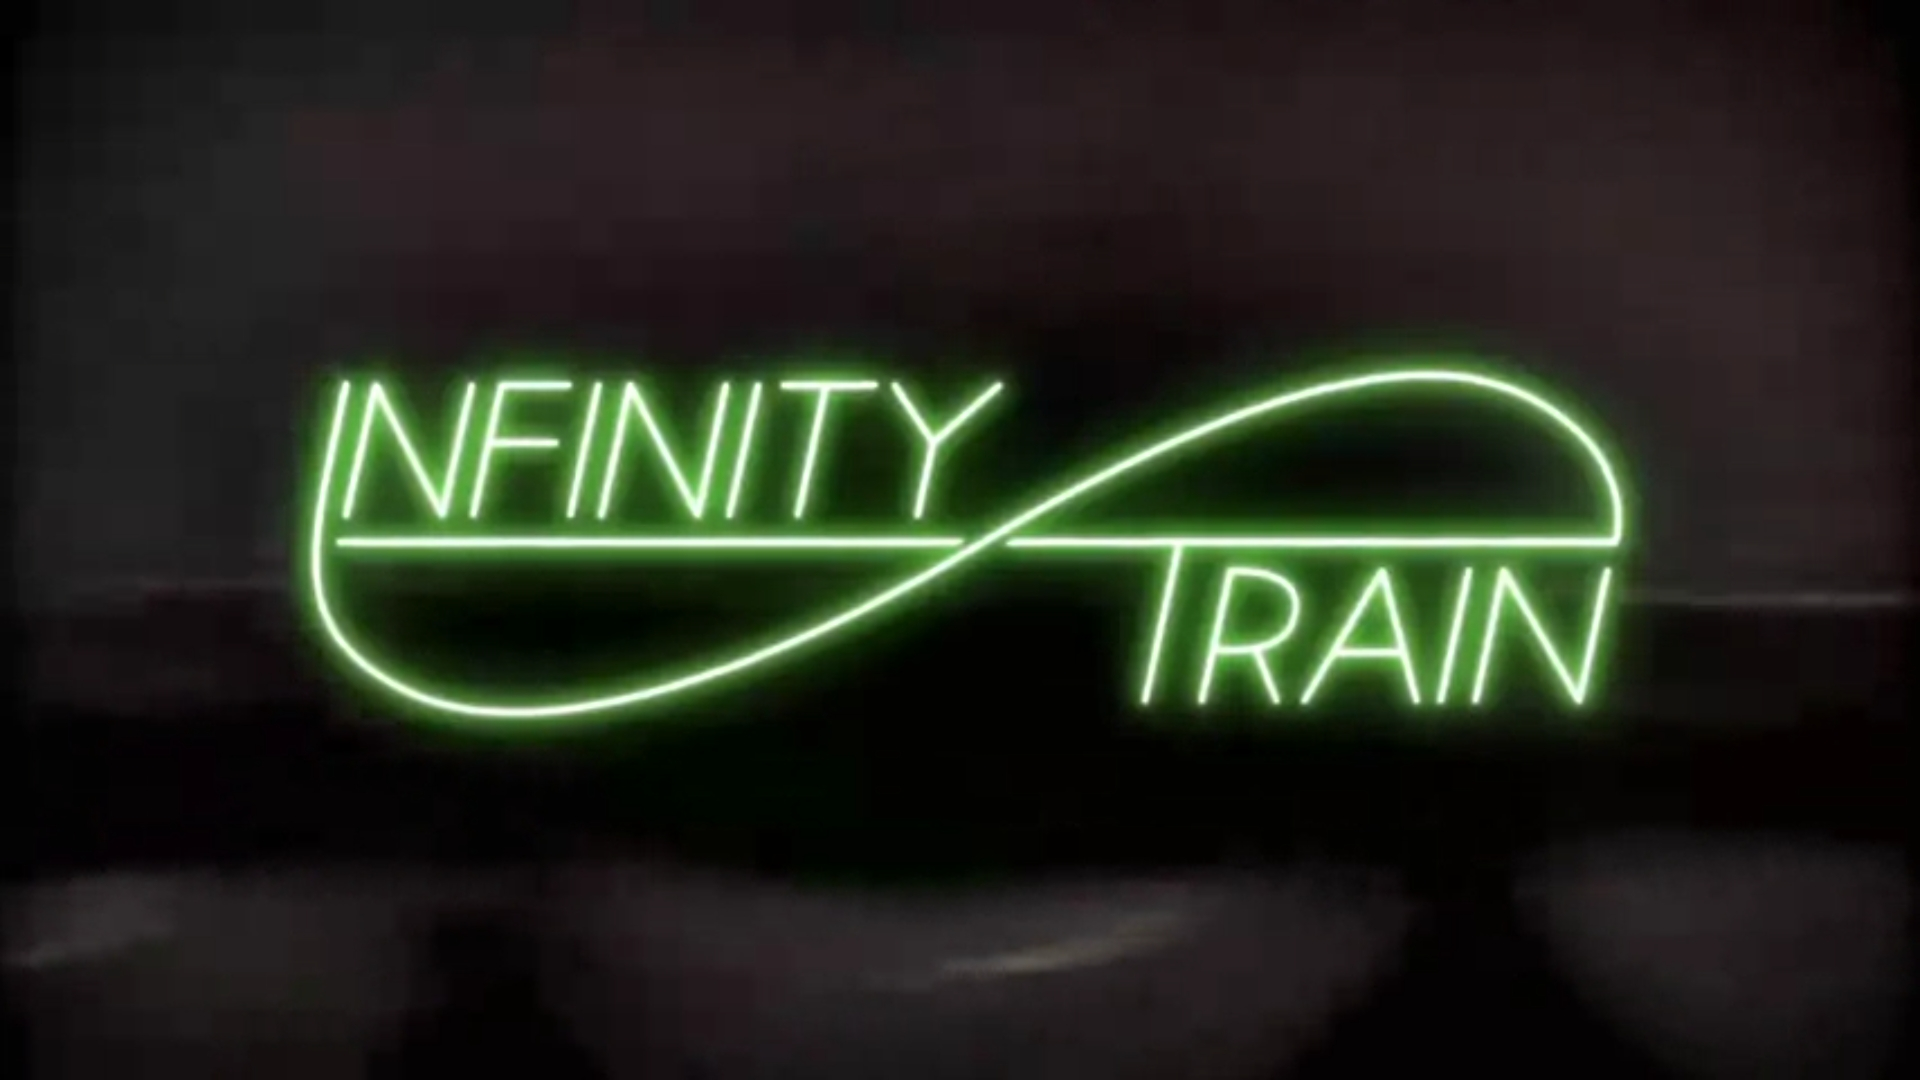 El tren infinito